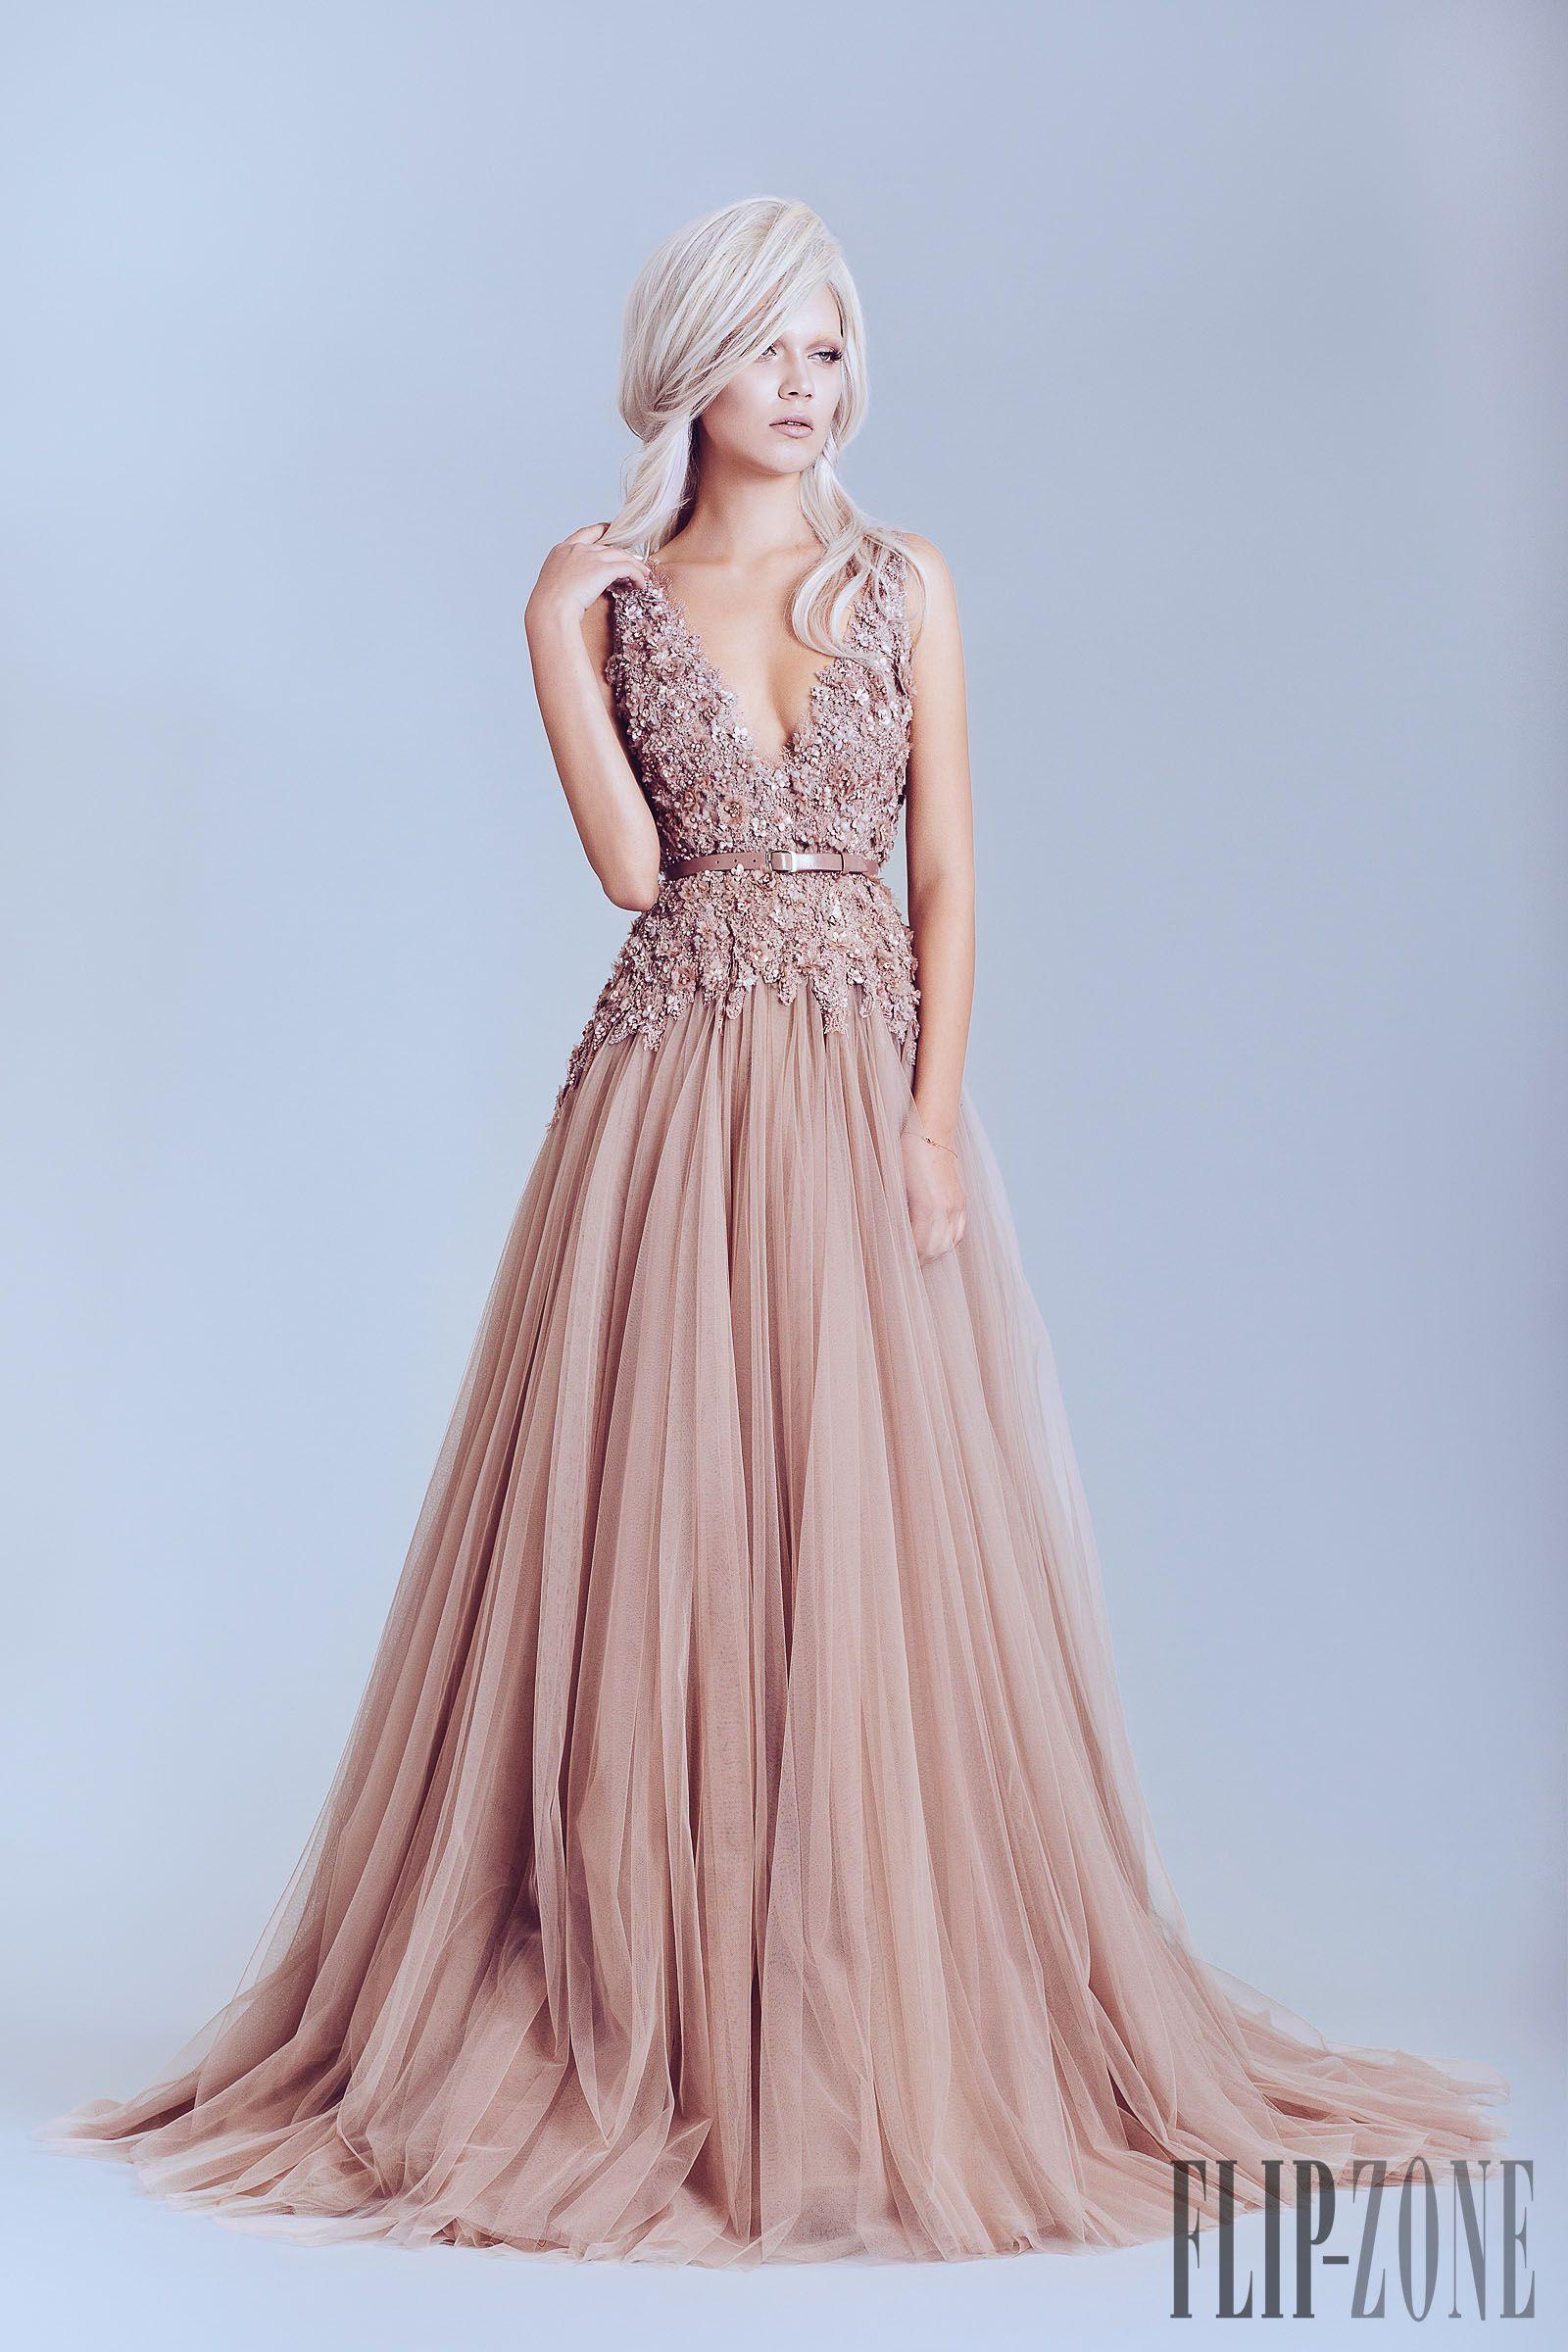 Blush Bridesmaids Dresses 2015